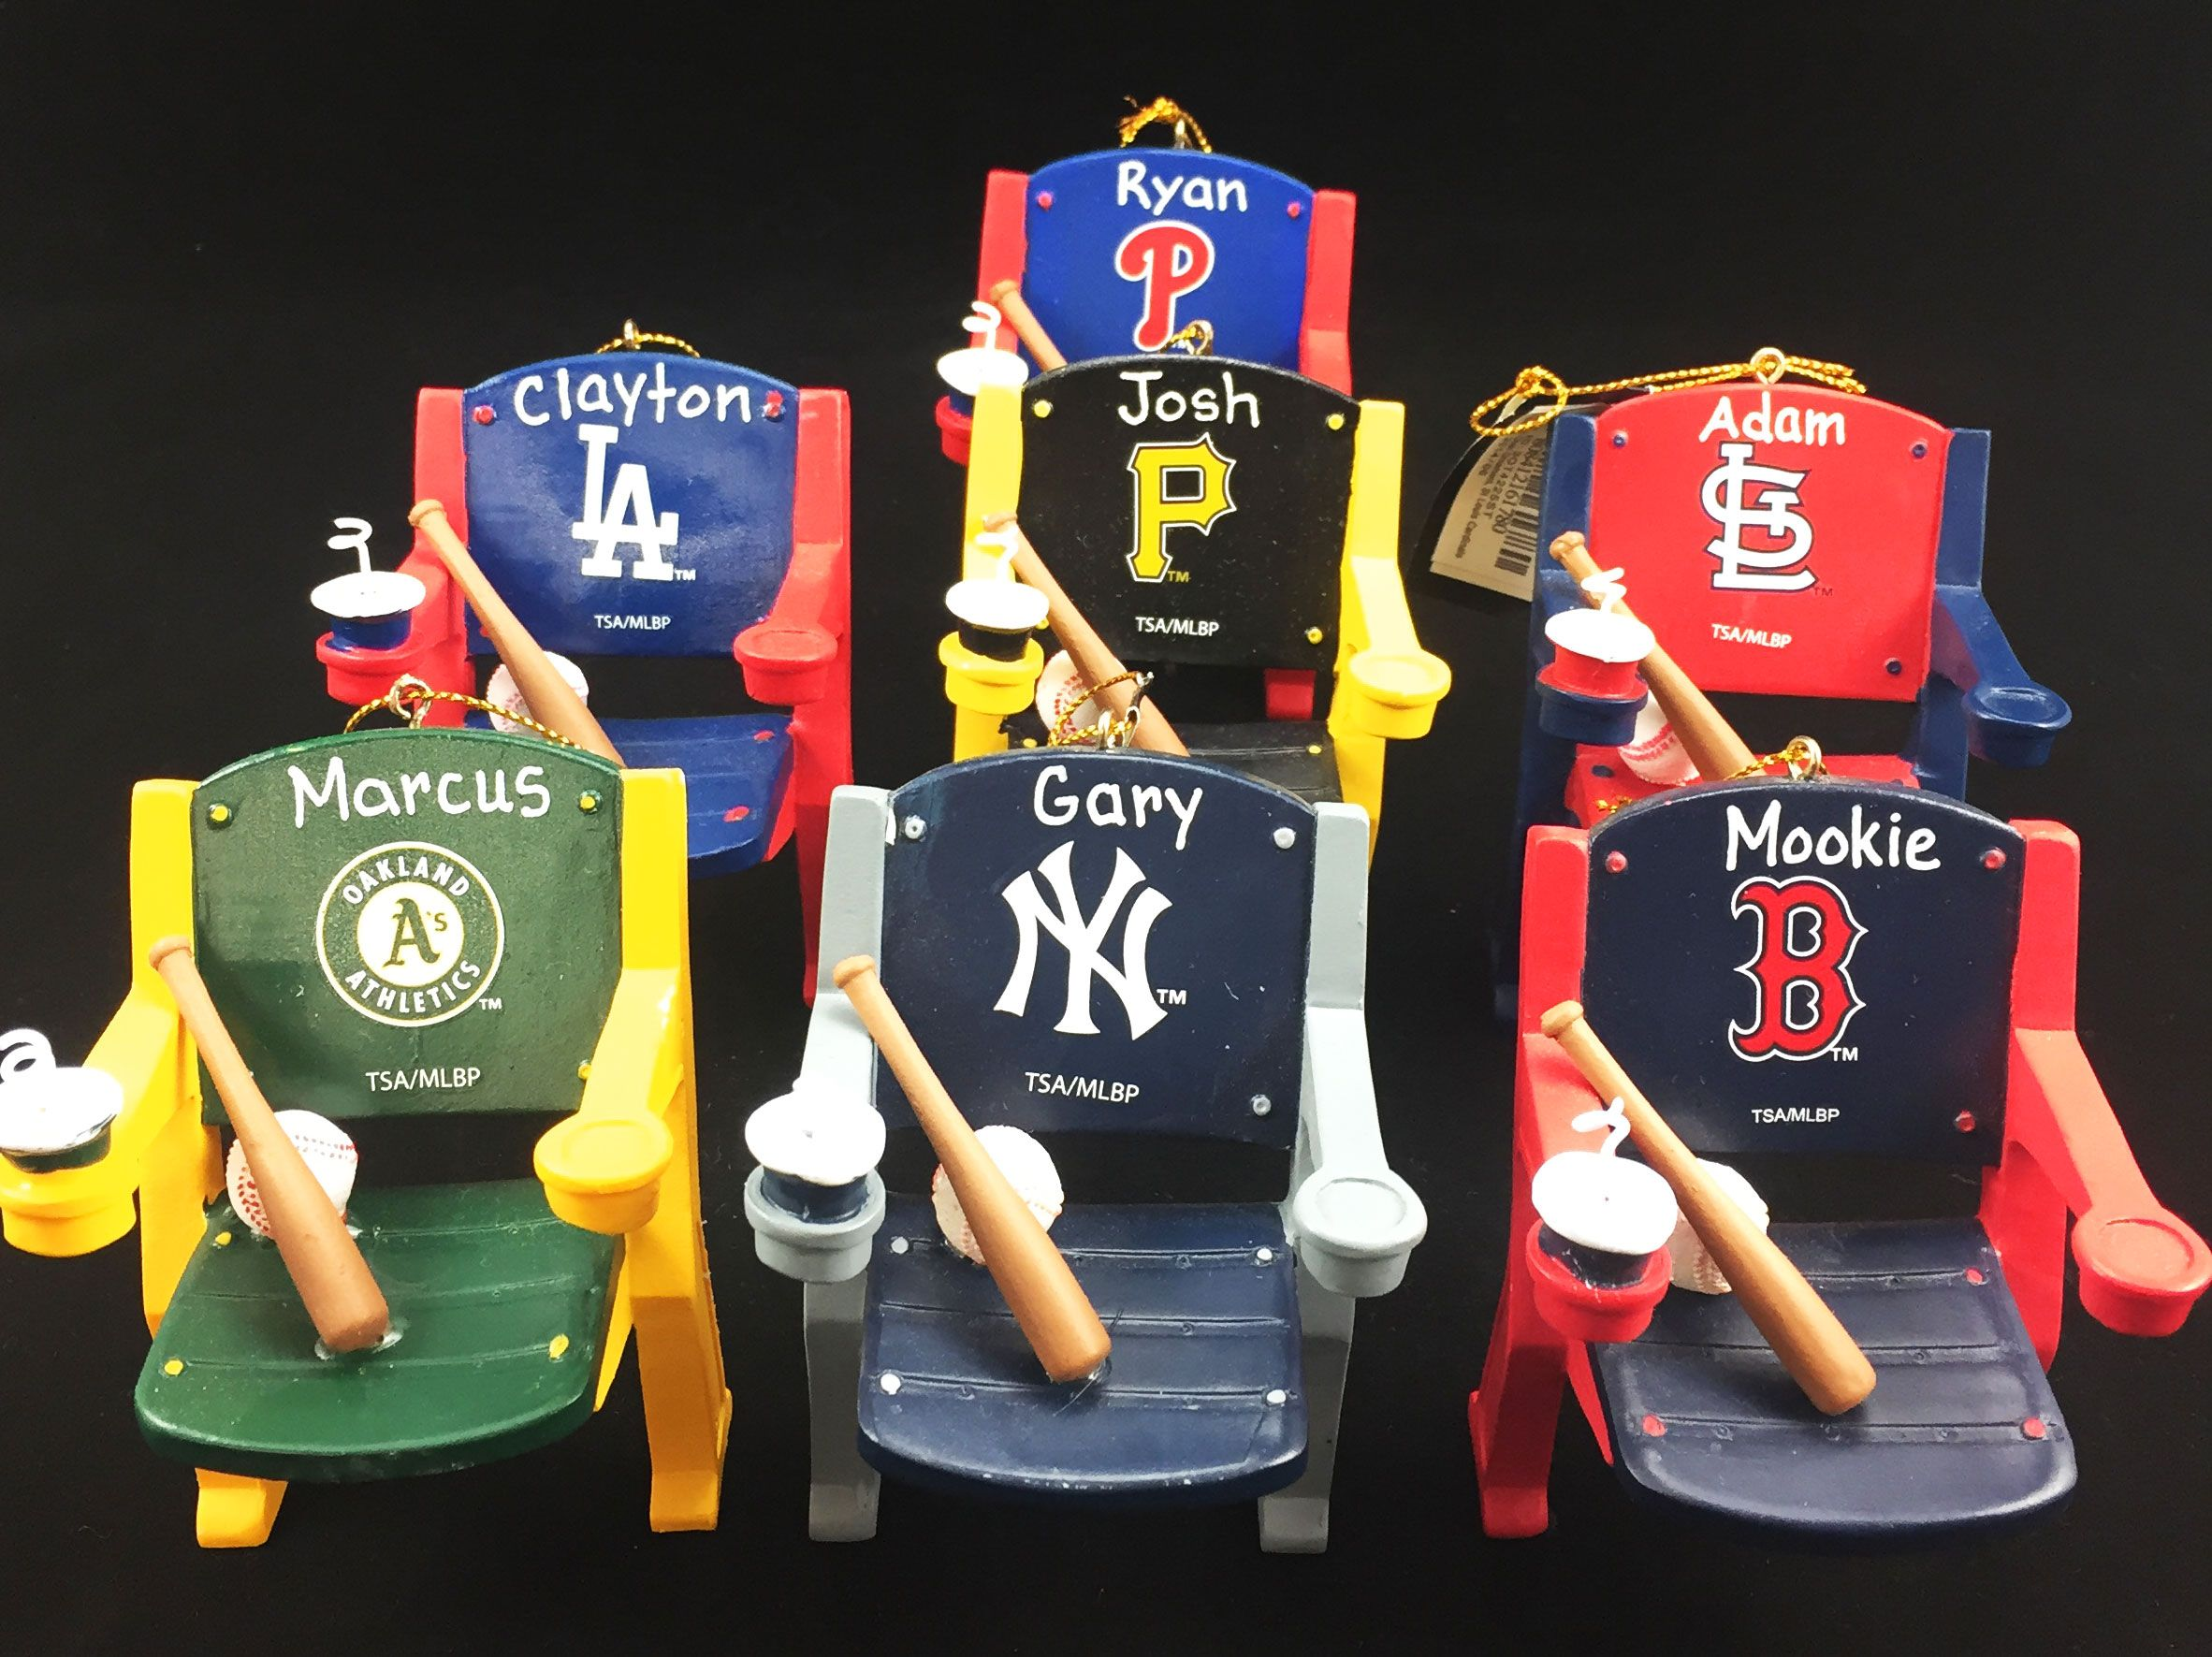 2017 Major League Baseball Season Preview Let The Cubs Dynasty Begin M I N G Baseball Photography Opening Day Baseball Baseball Season